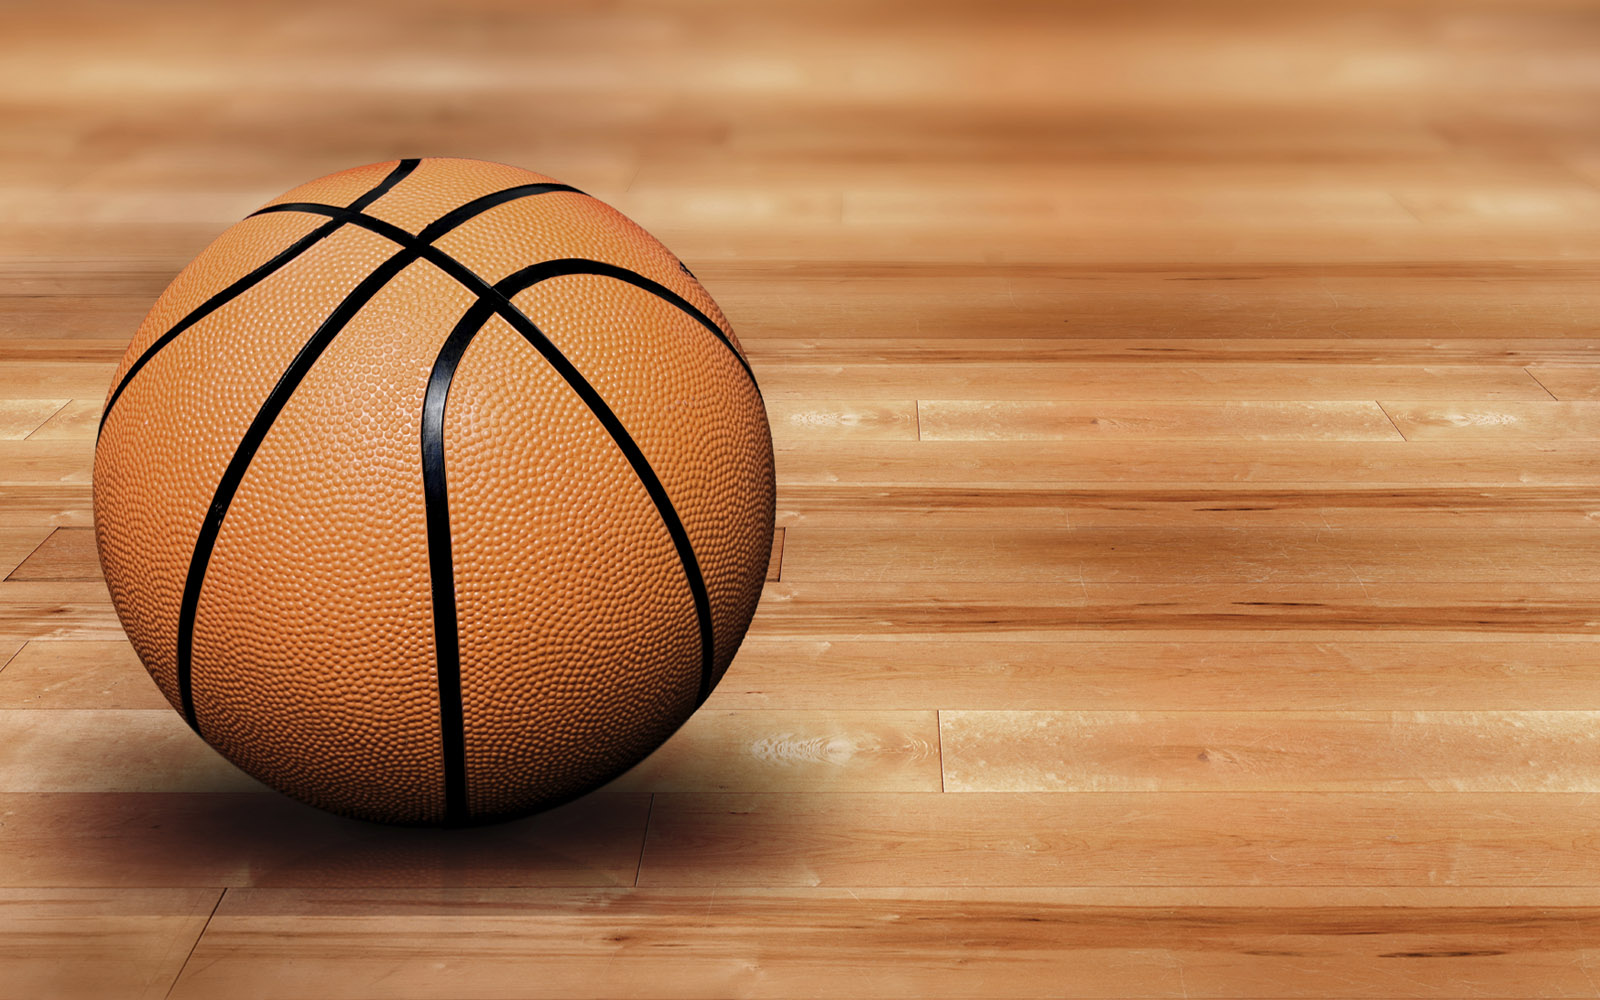 basketball court nba wallpaper share this cool nba basketball team 1600x1000